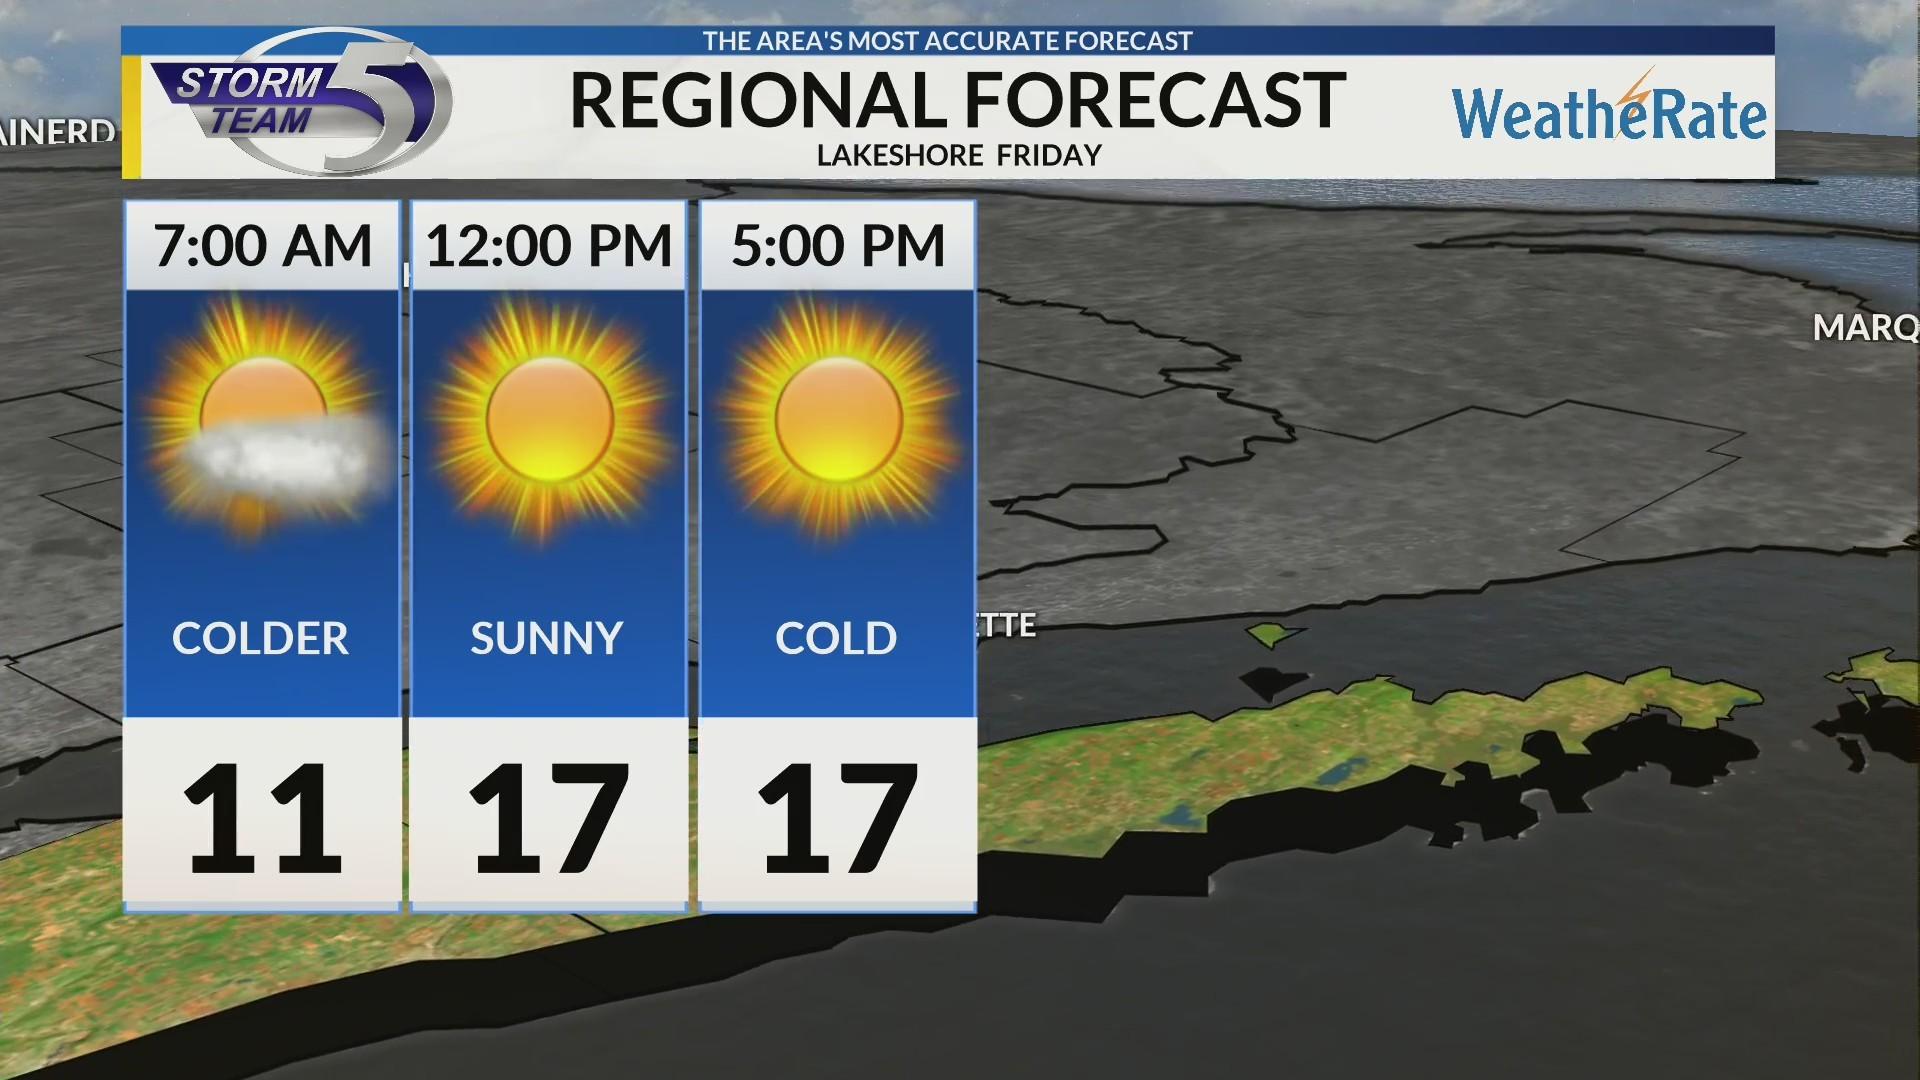 Regional Forecast: Lakeshore 2/15/2019